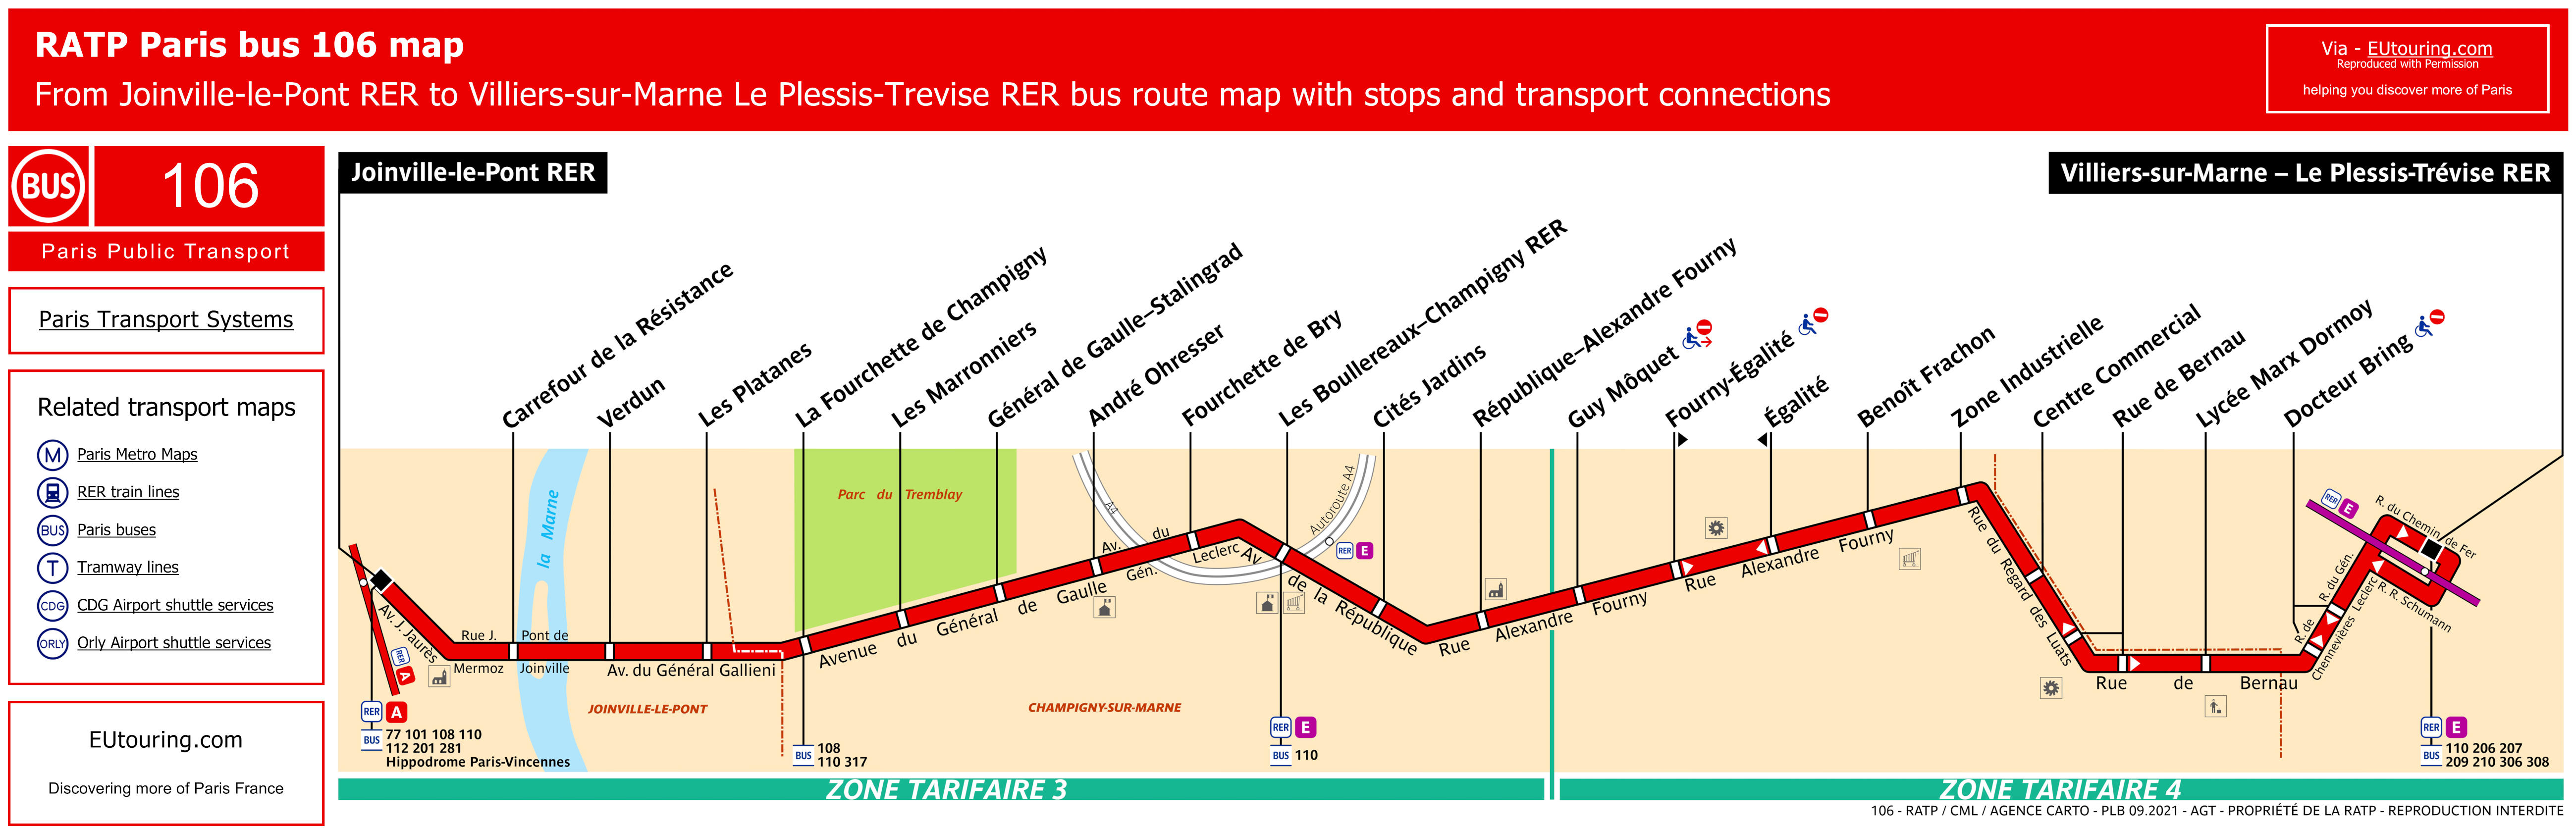 ratp route maps for paris bus lines 100 through to 109